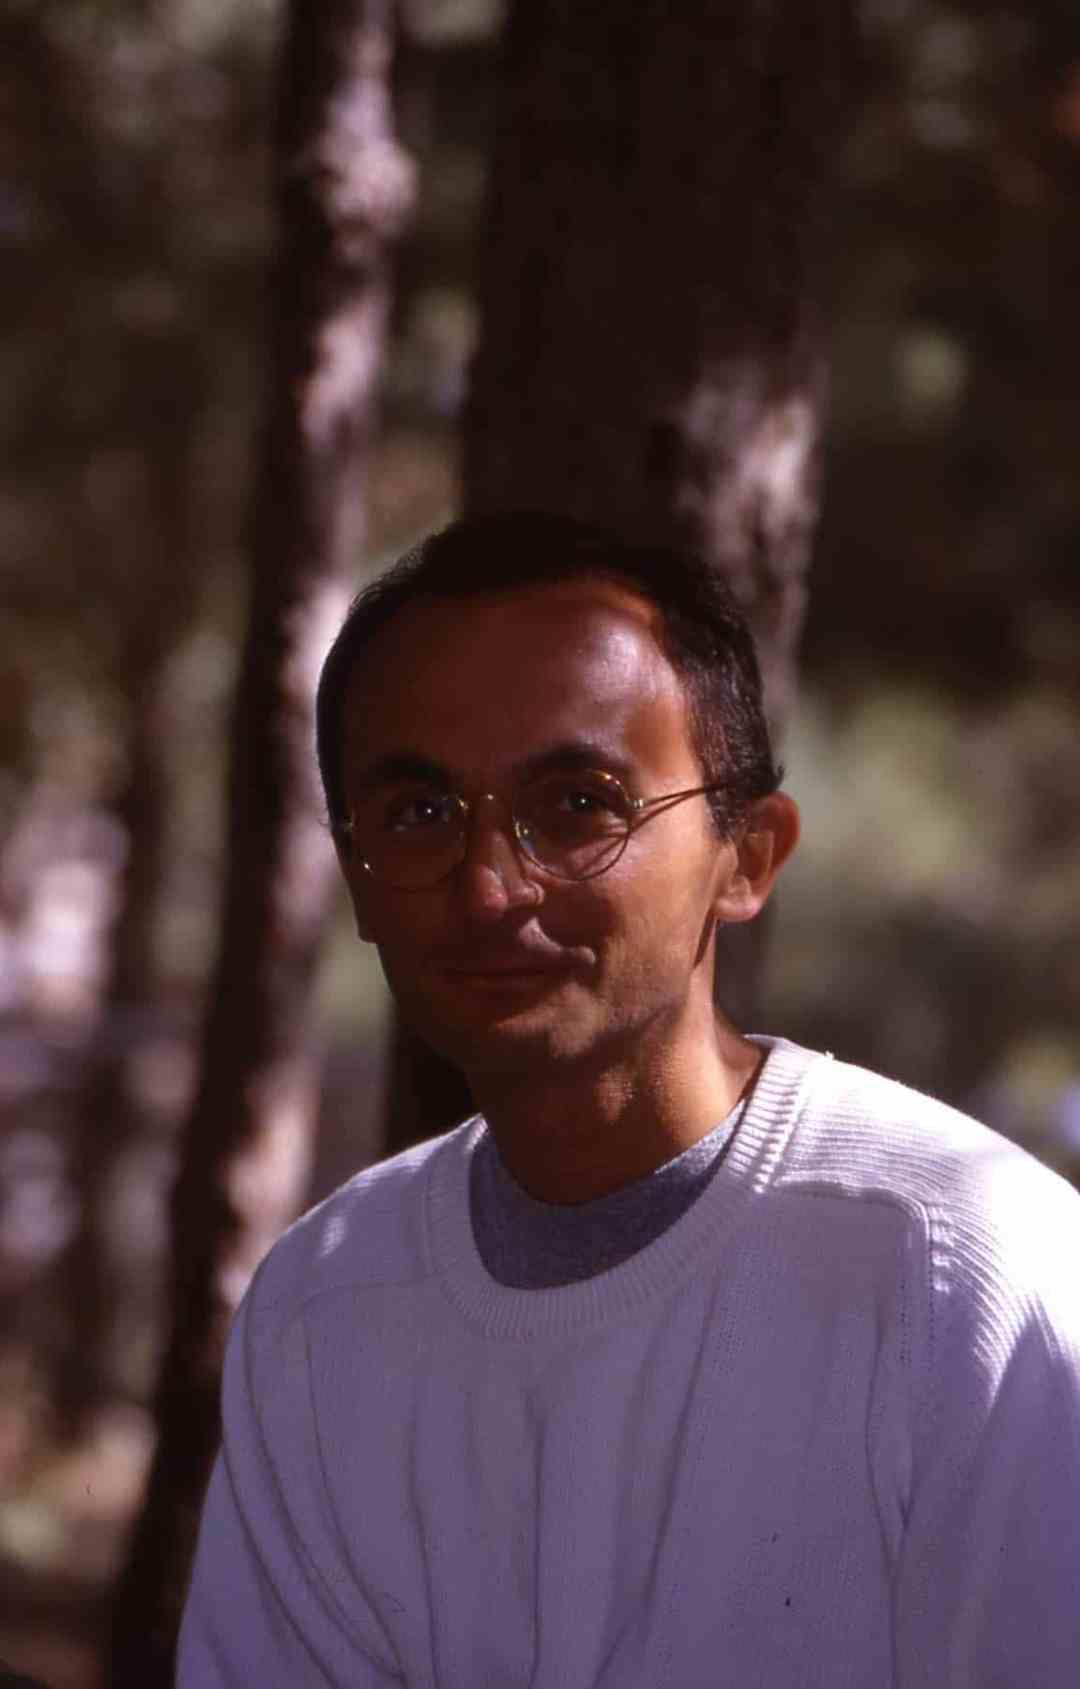 Lungo la via - Campo Santa Venere 1998